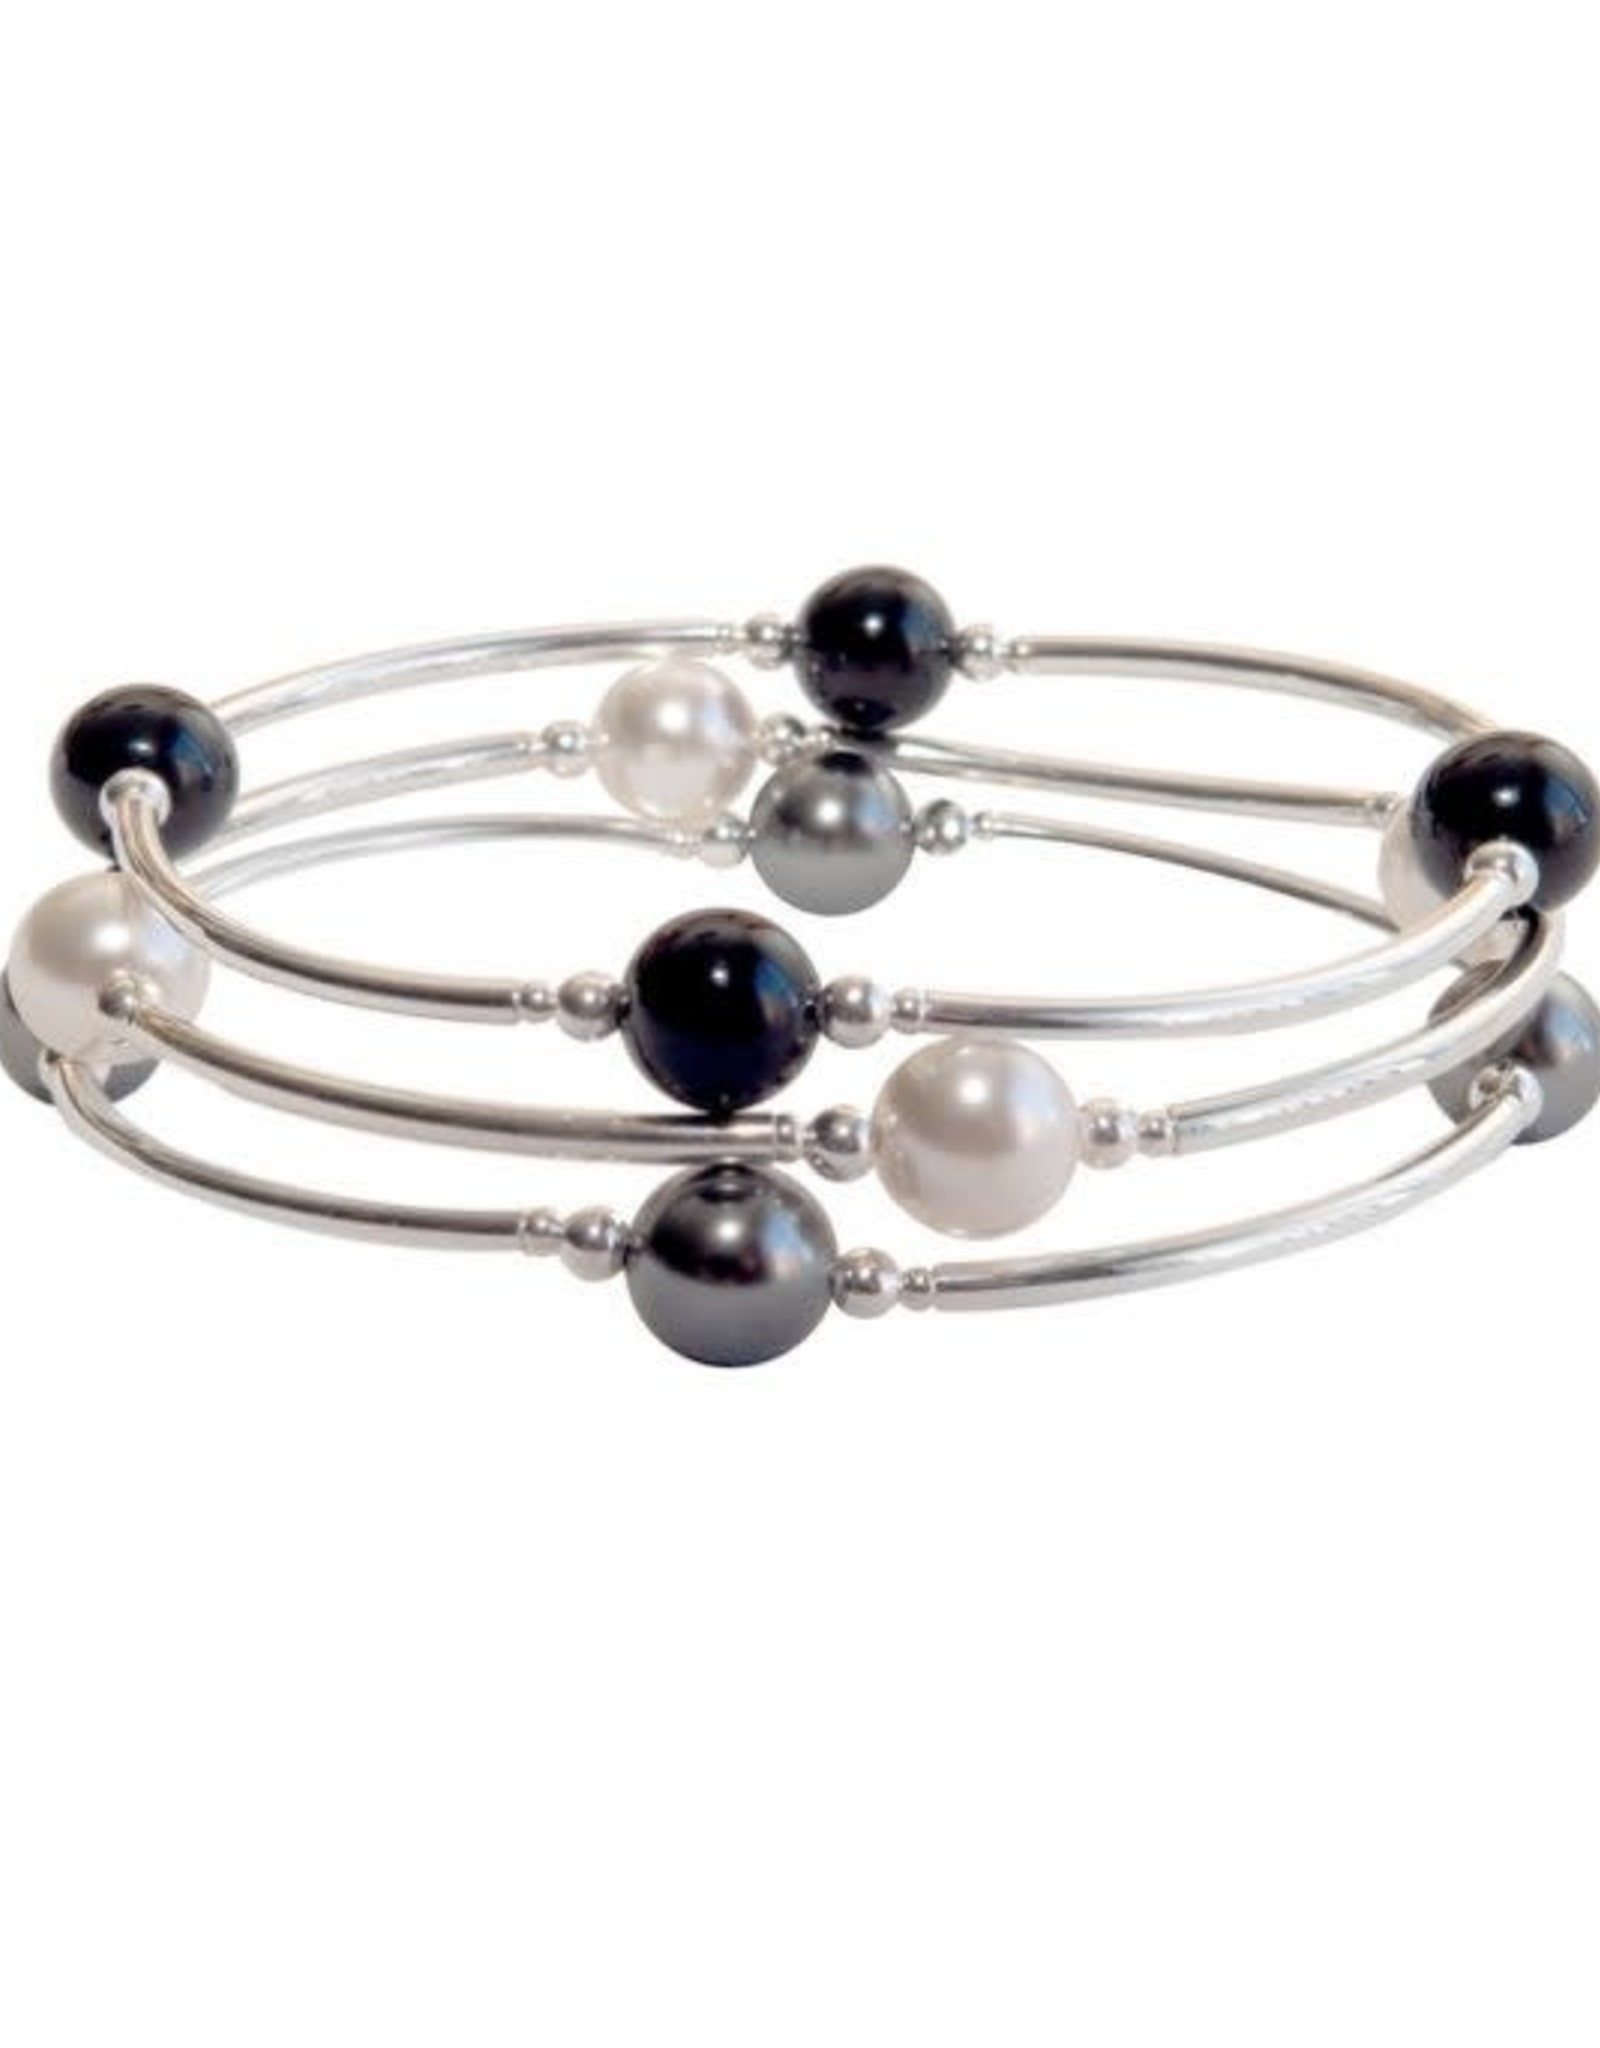 Made As Intended 8mm White Pearl Blessing Bracelet